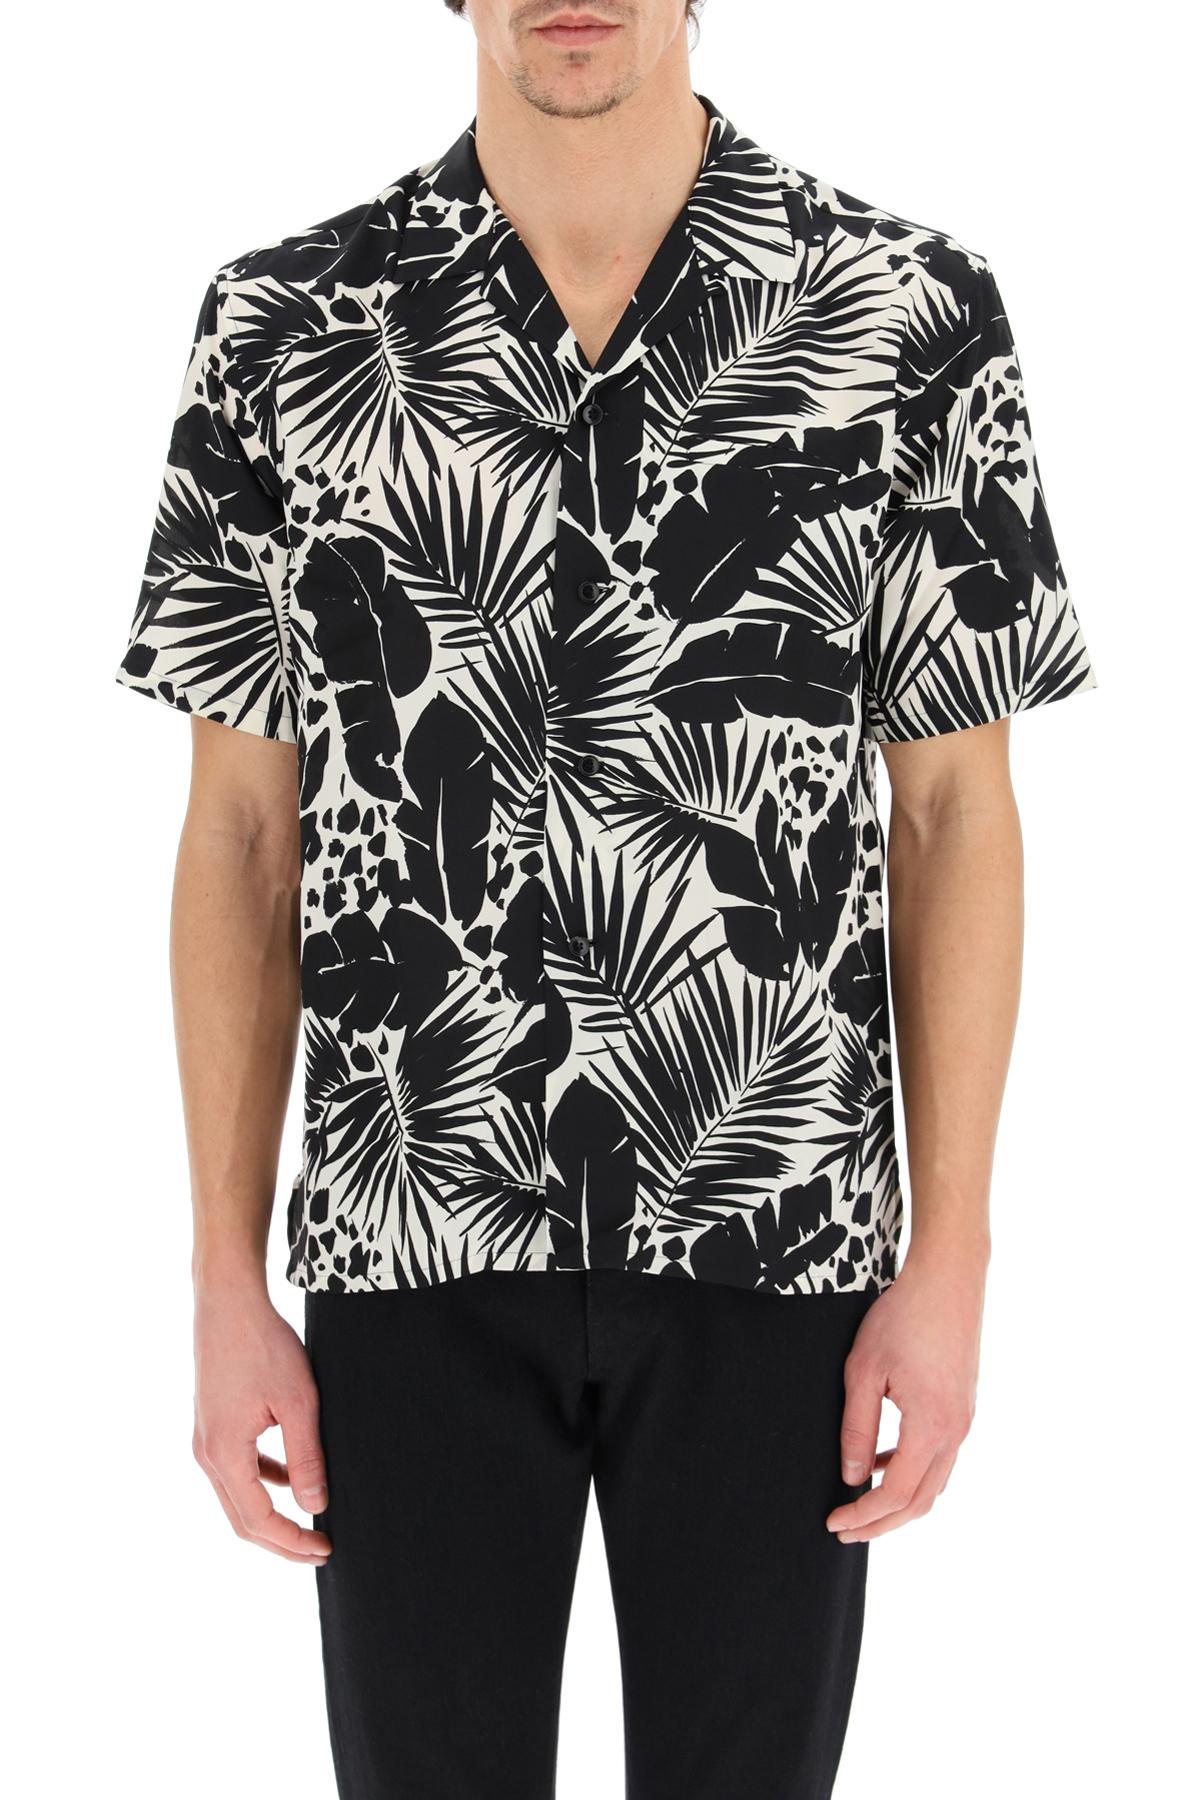 Saint laurent camicia stampa foglia tropical